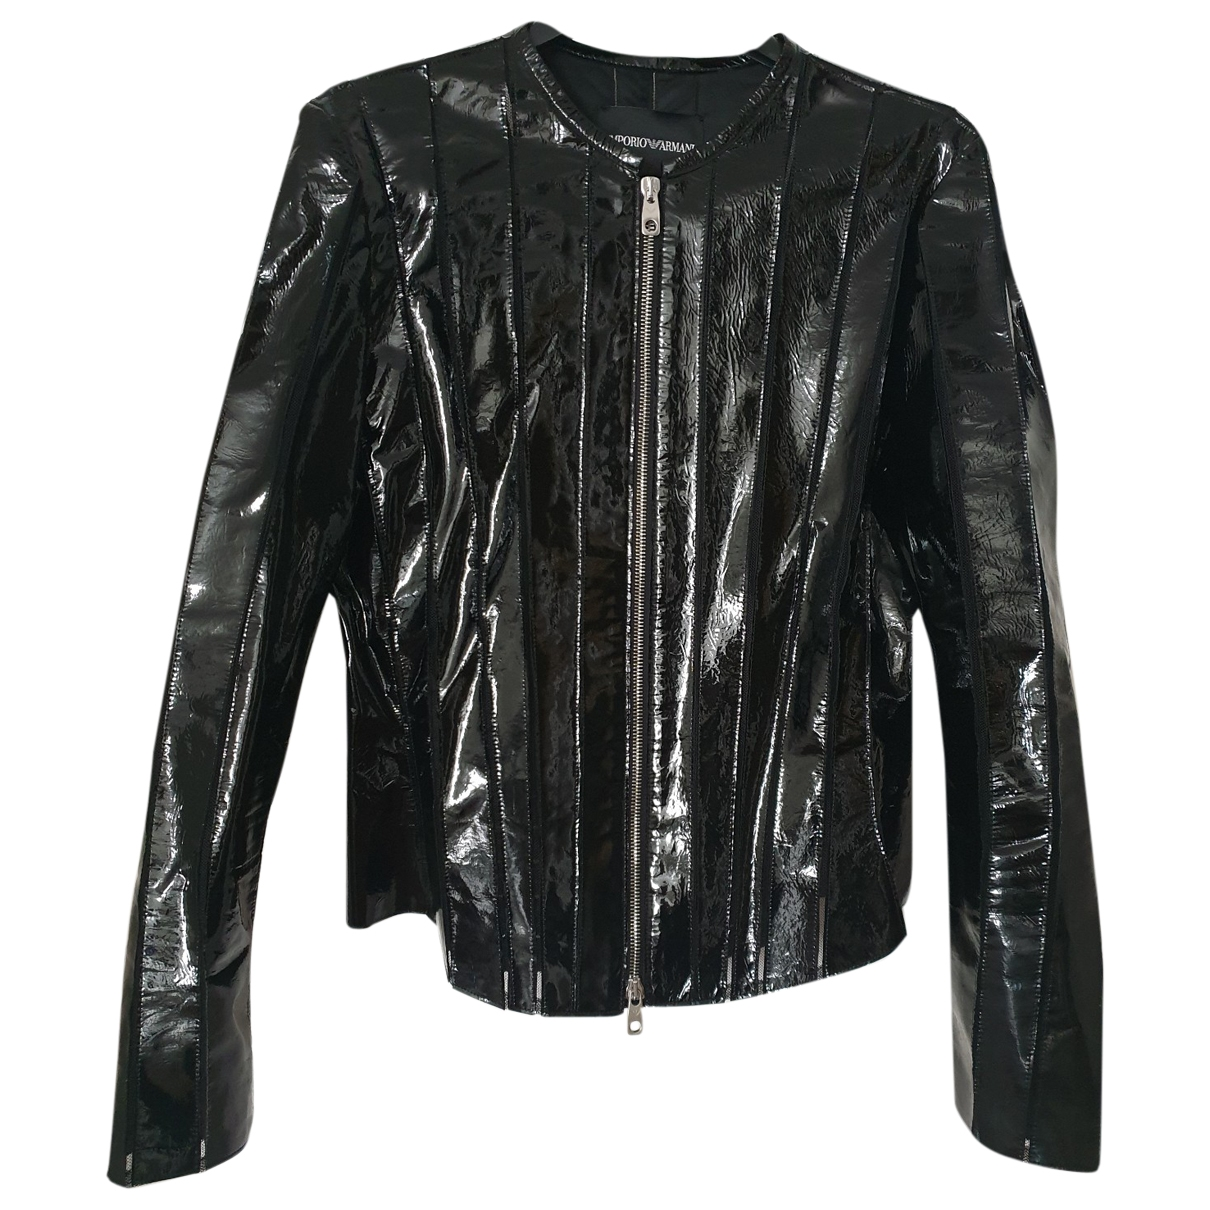 Emporio Armani \N Black Leather jacket for Women 42 IT